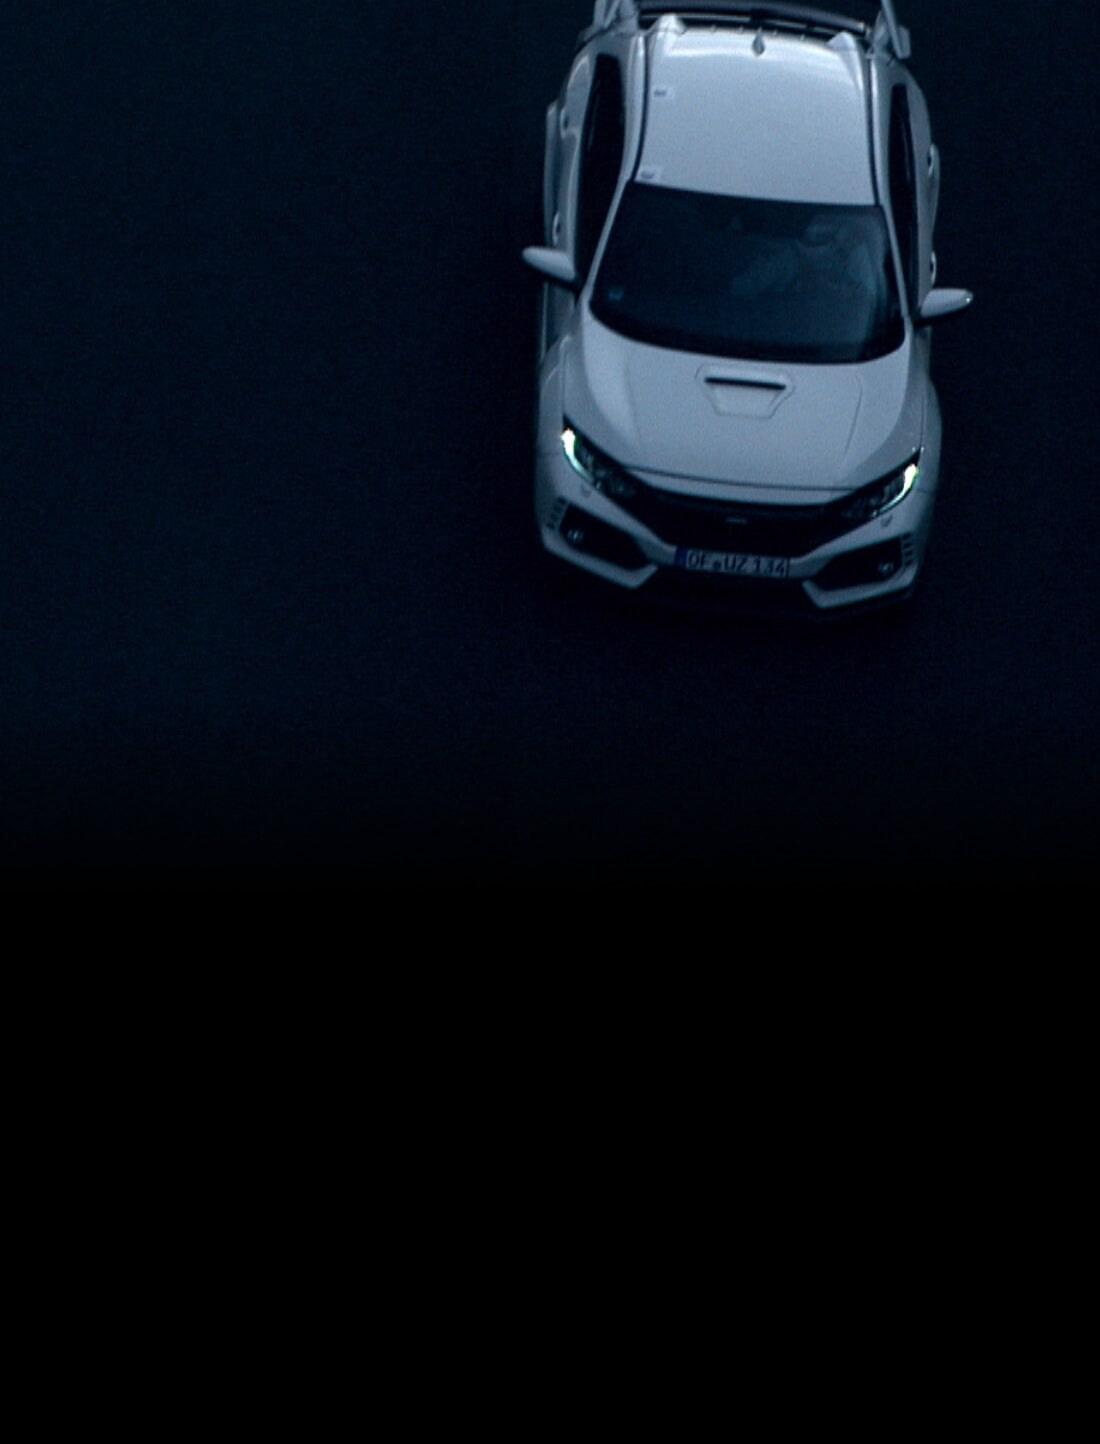 2019 Civic Type R: Impressive Horsepower & Powerful Design | Honda